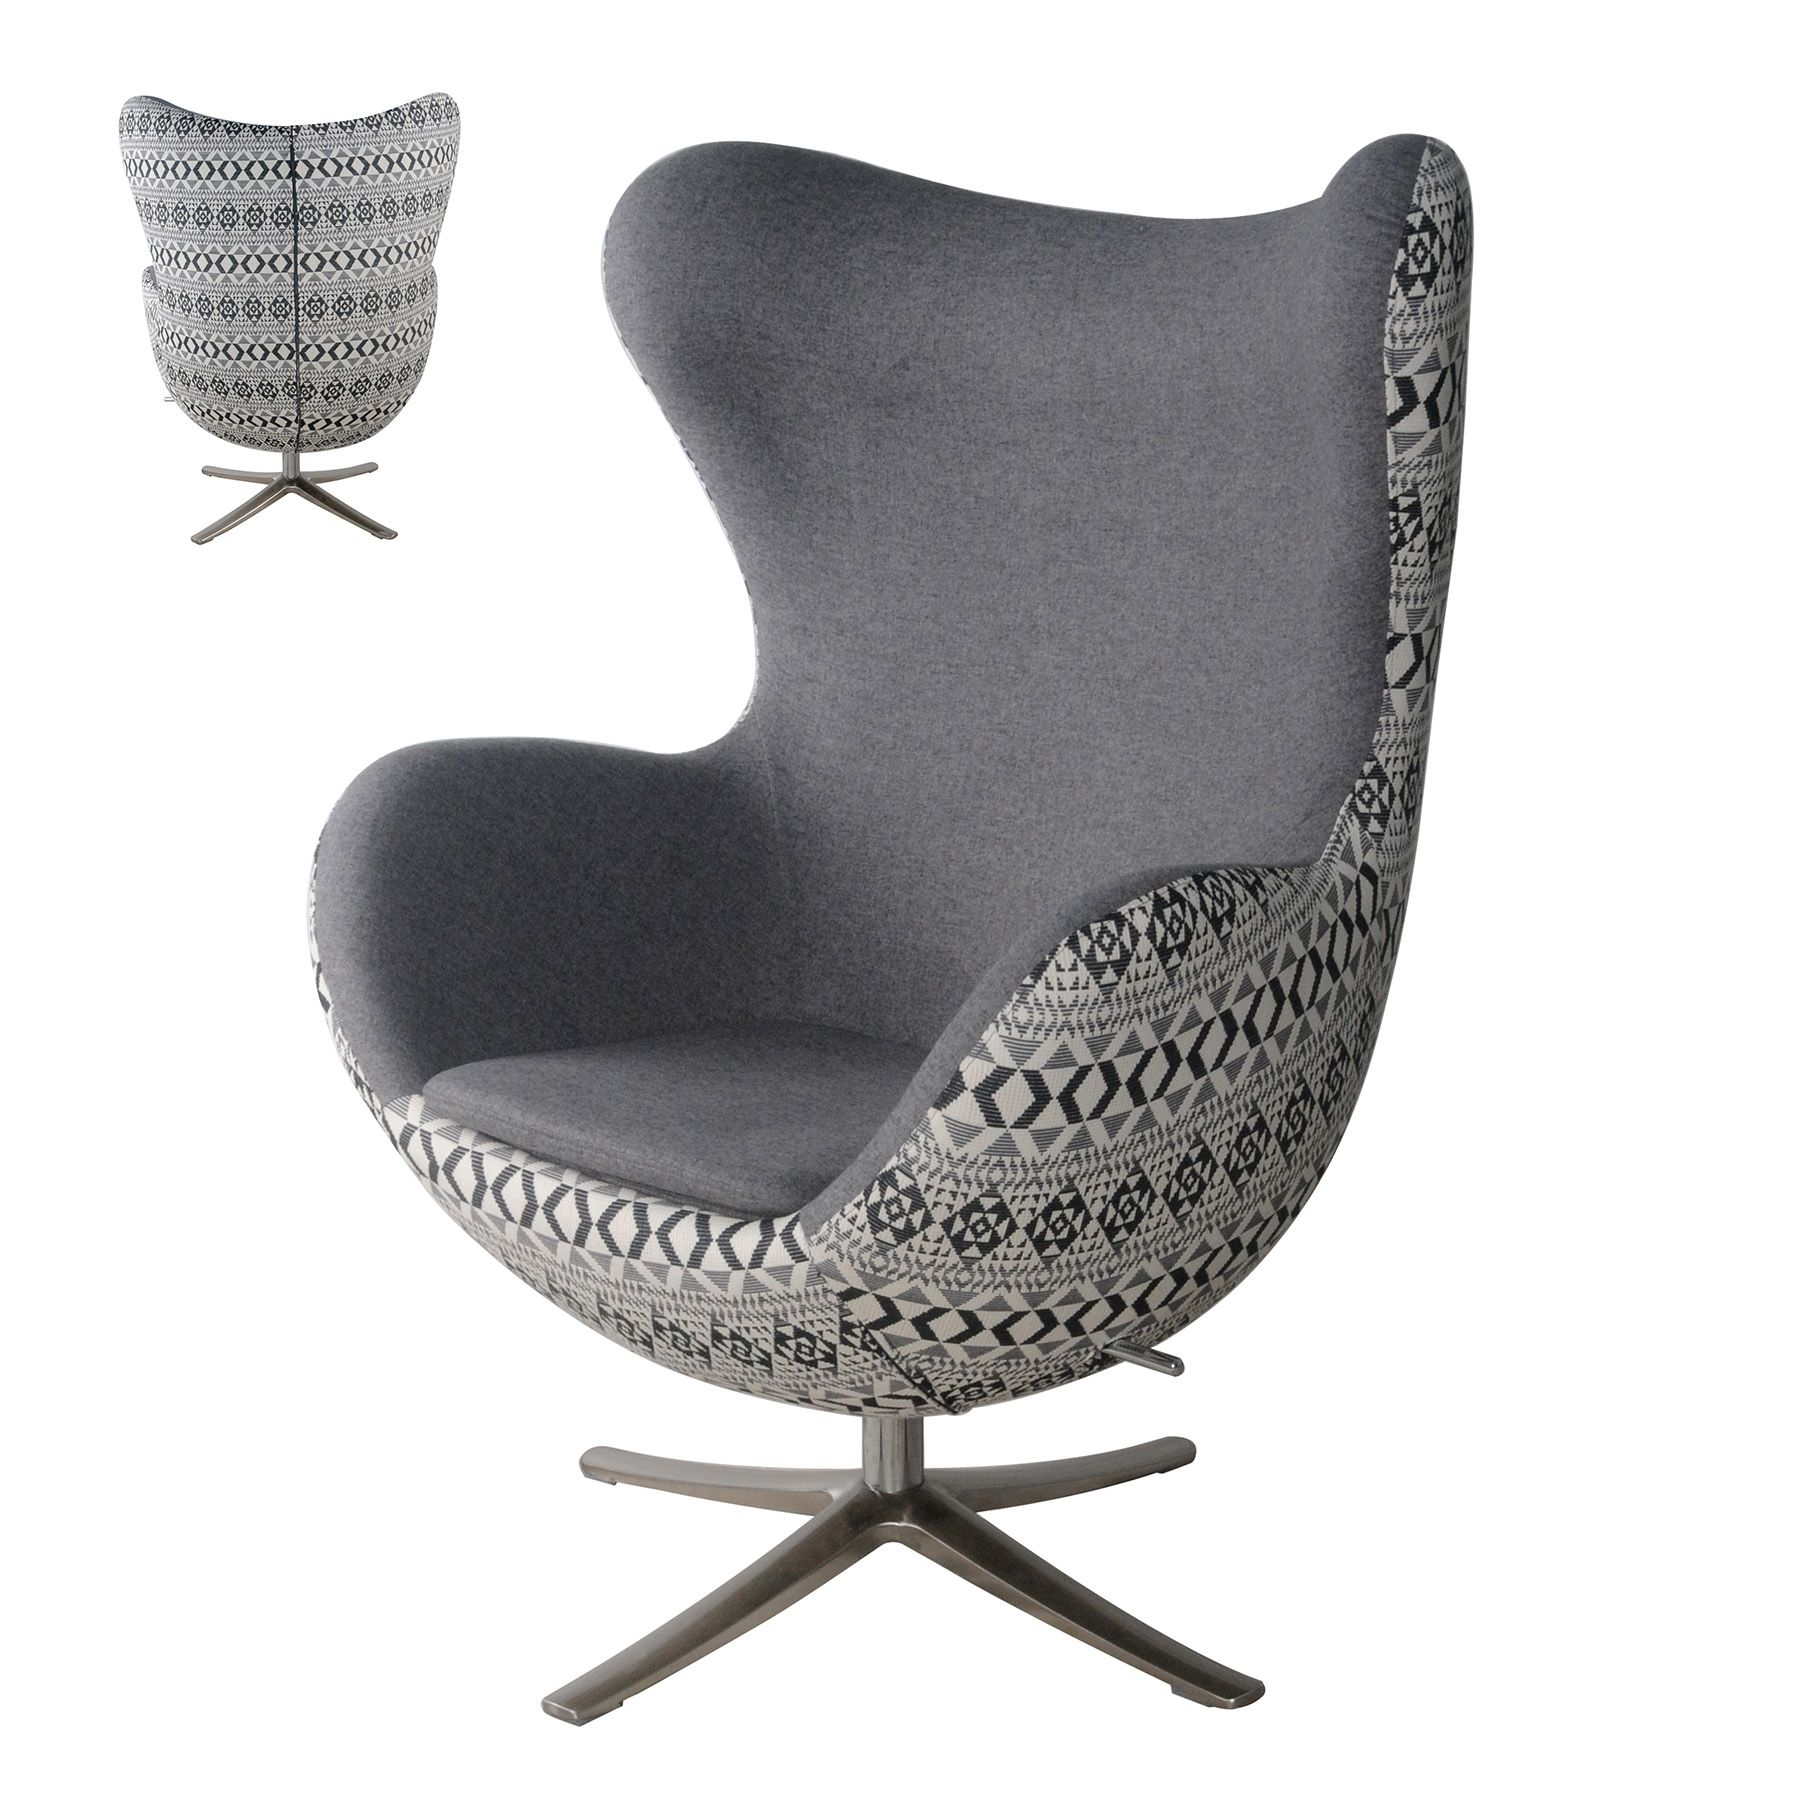 mid century egg chair max fabric swivel rocker chair chrome legs rh pinterest de